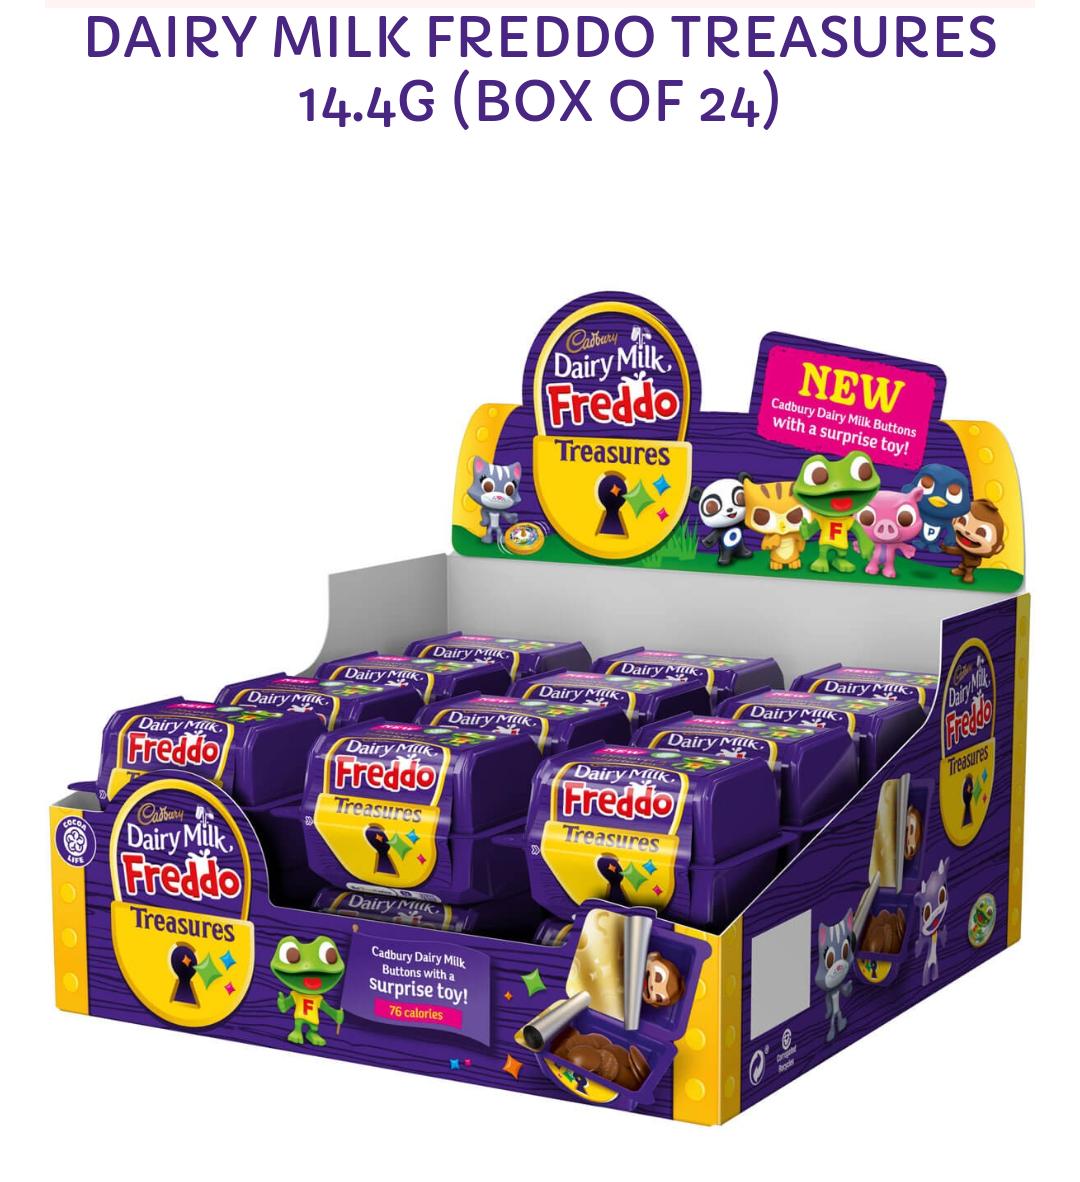 24 Cadbury Freddo treasures (chocolate & toy) now £5 in store Cadbury Outlet Junction 32 Castleford